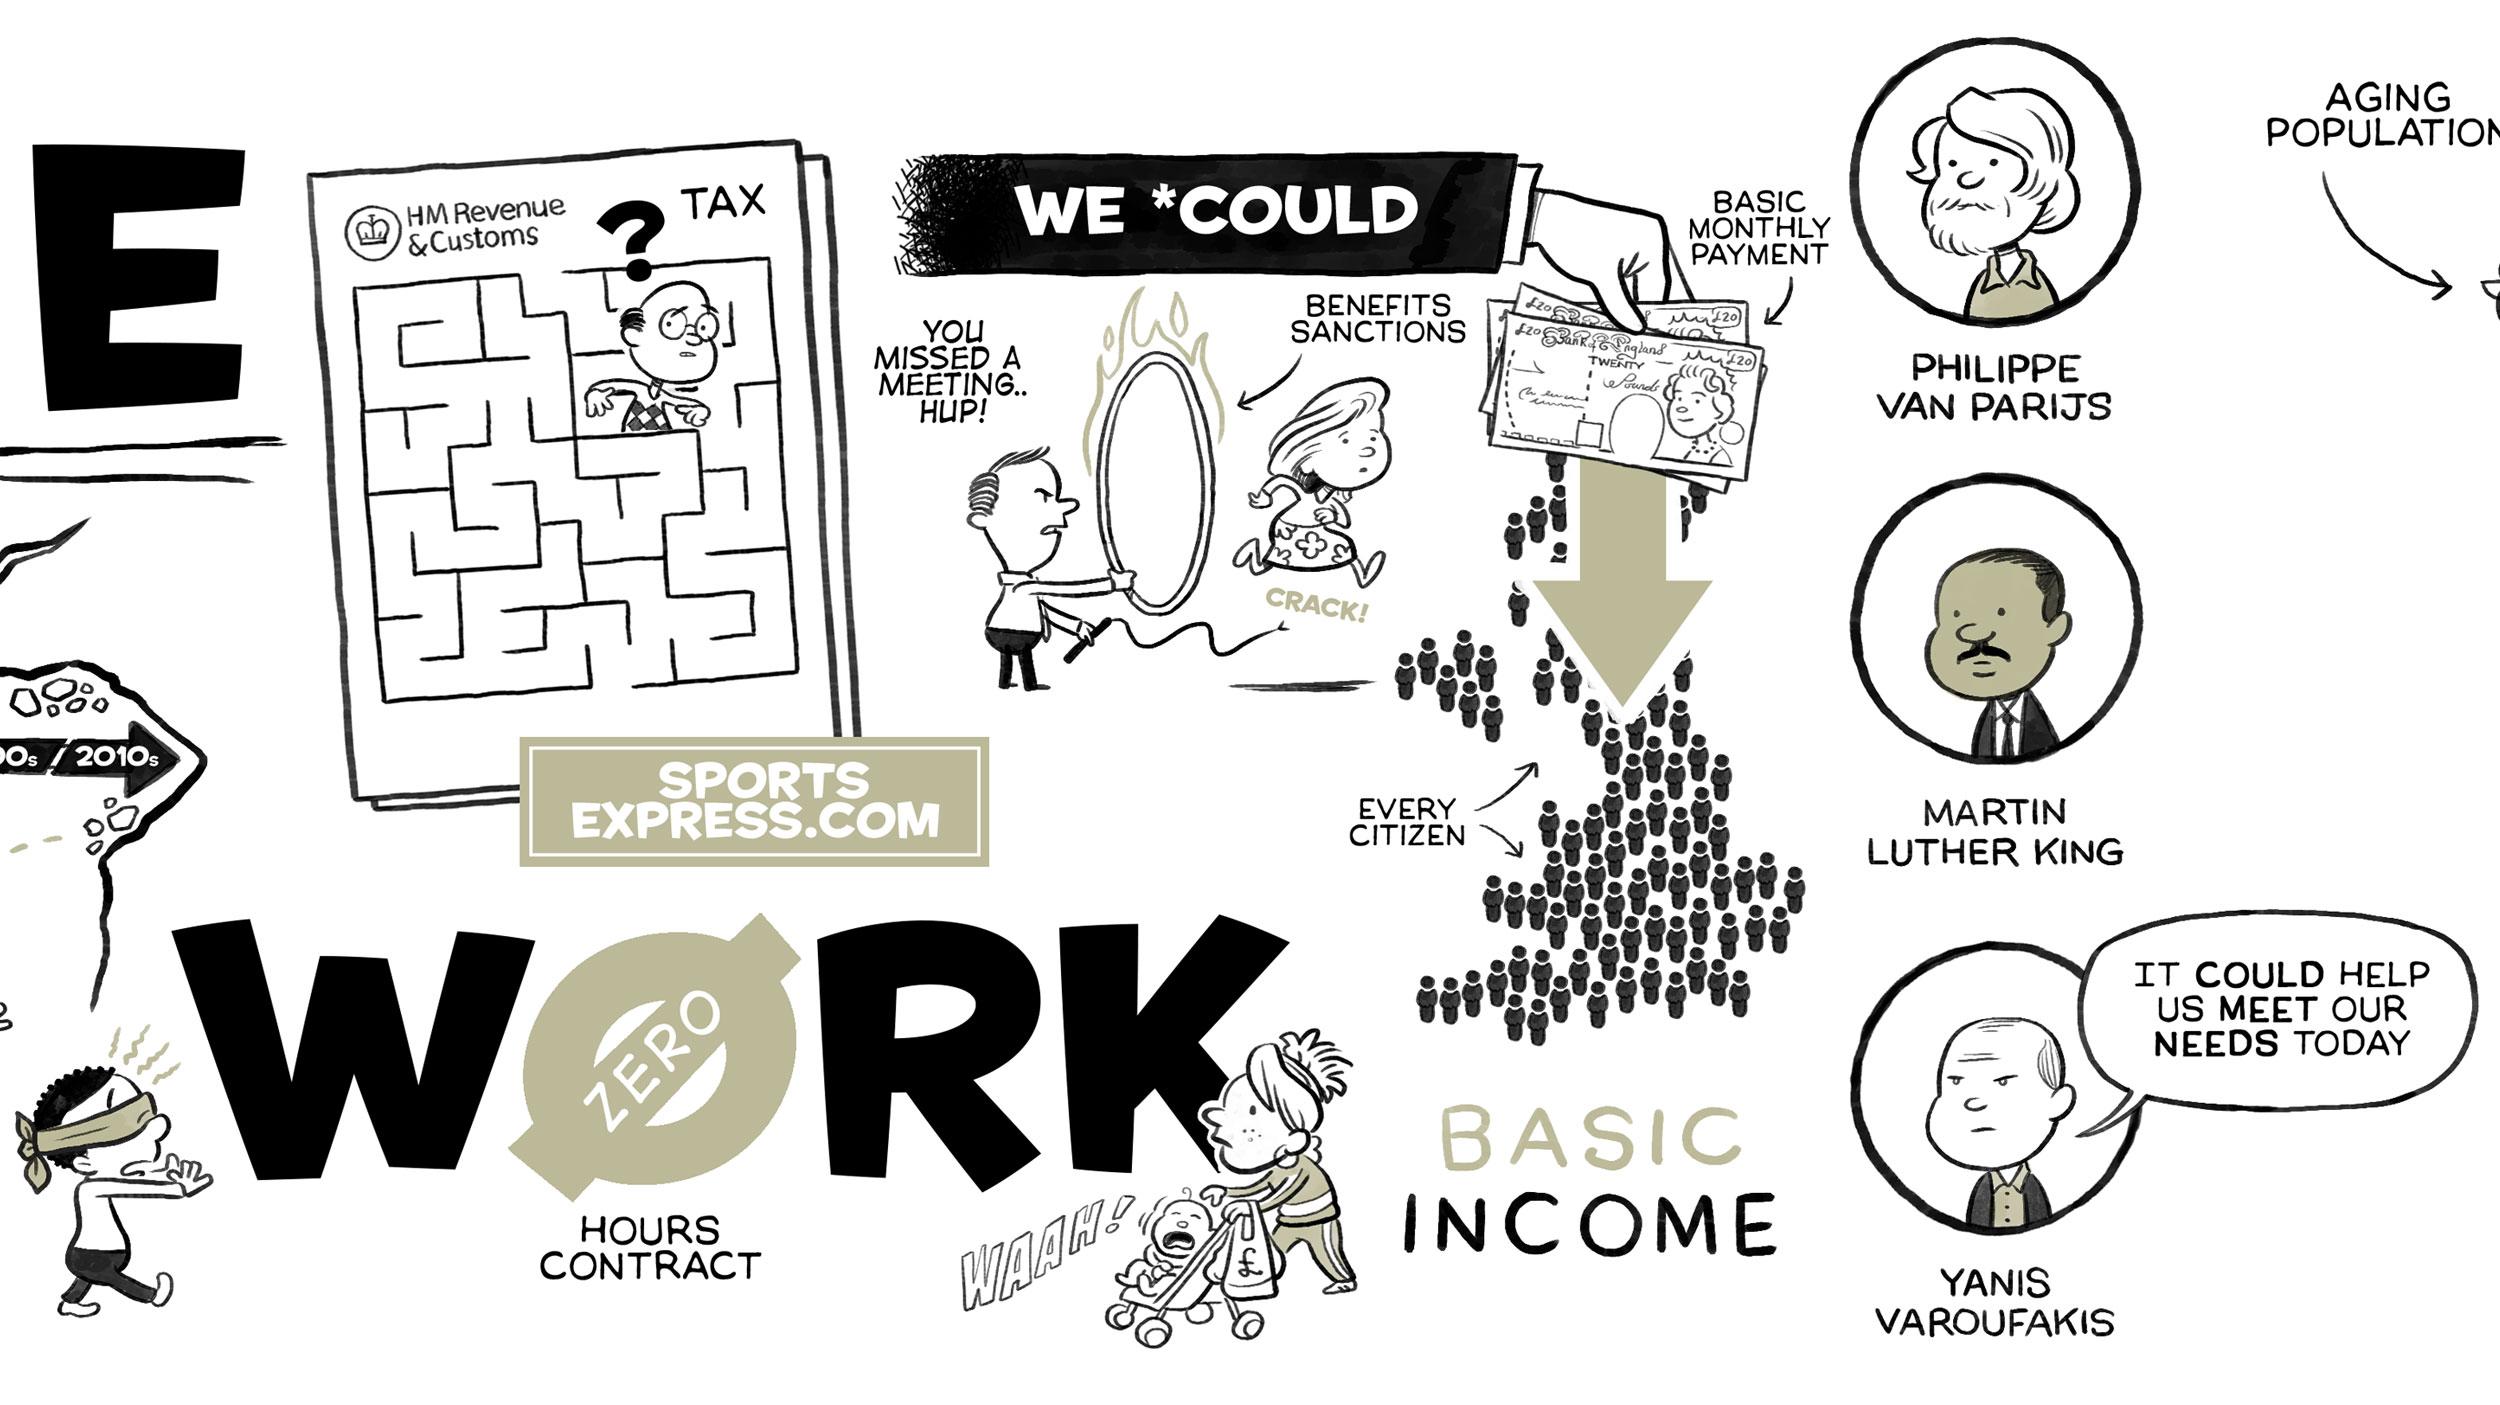 rsa-basic-income-cognitive-03.jpg